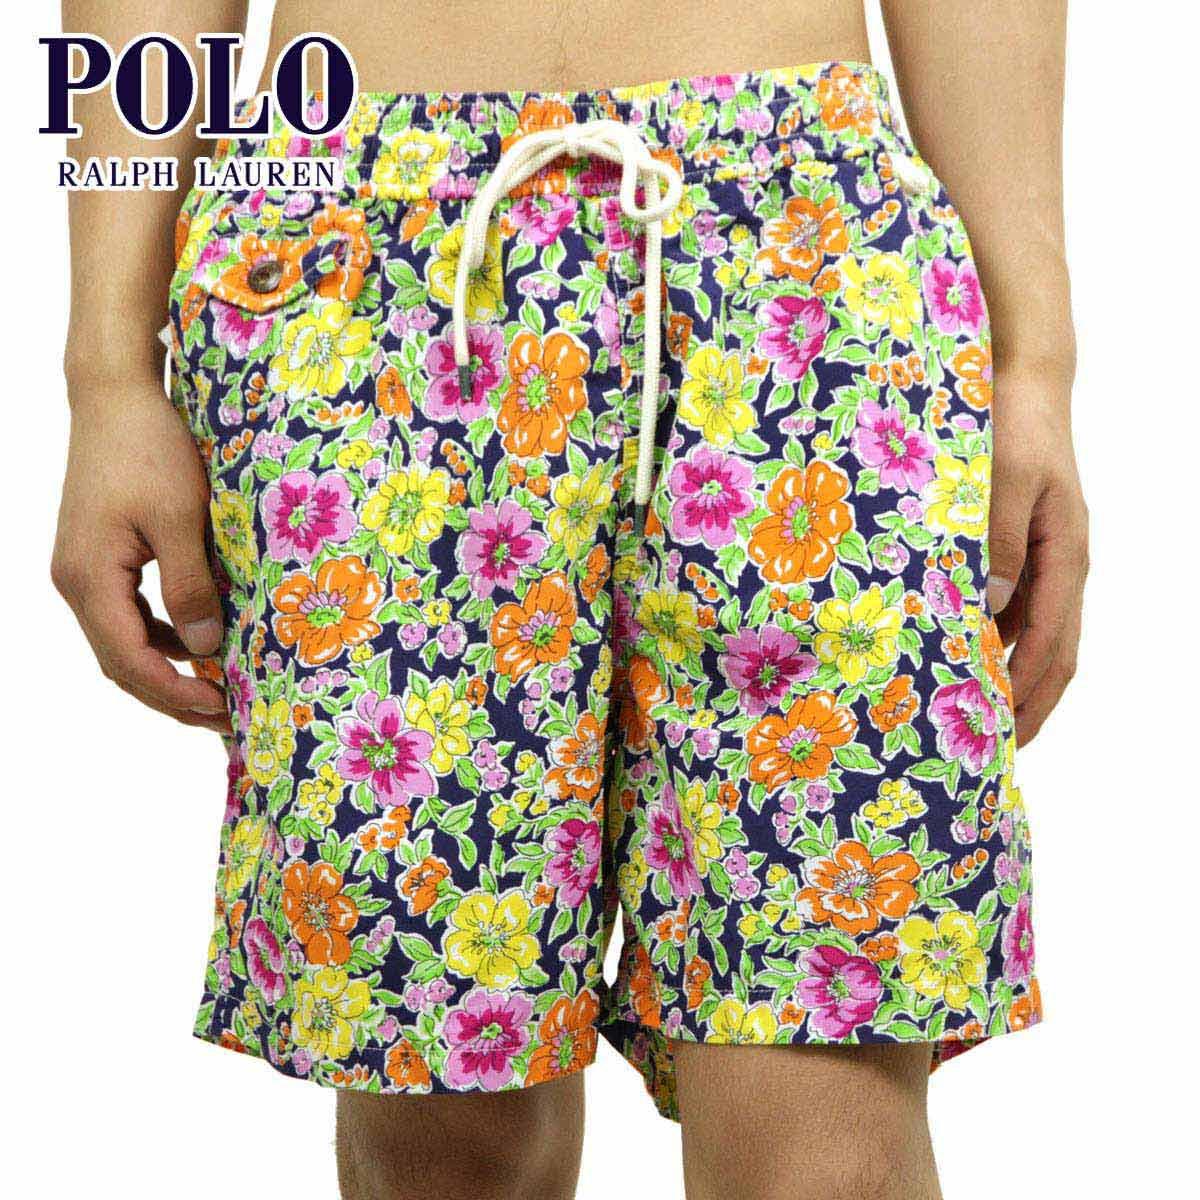 0eb6d4412996f Rakuten Ichiba shop MIXON: Polo Ralph Lauren POLO RALPH LAUREN regular  article men swimming underwear Traveler Floral Swim Shorts D20S30 | Rakuten  Global ...